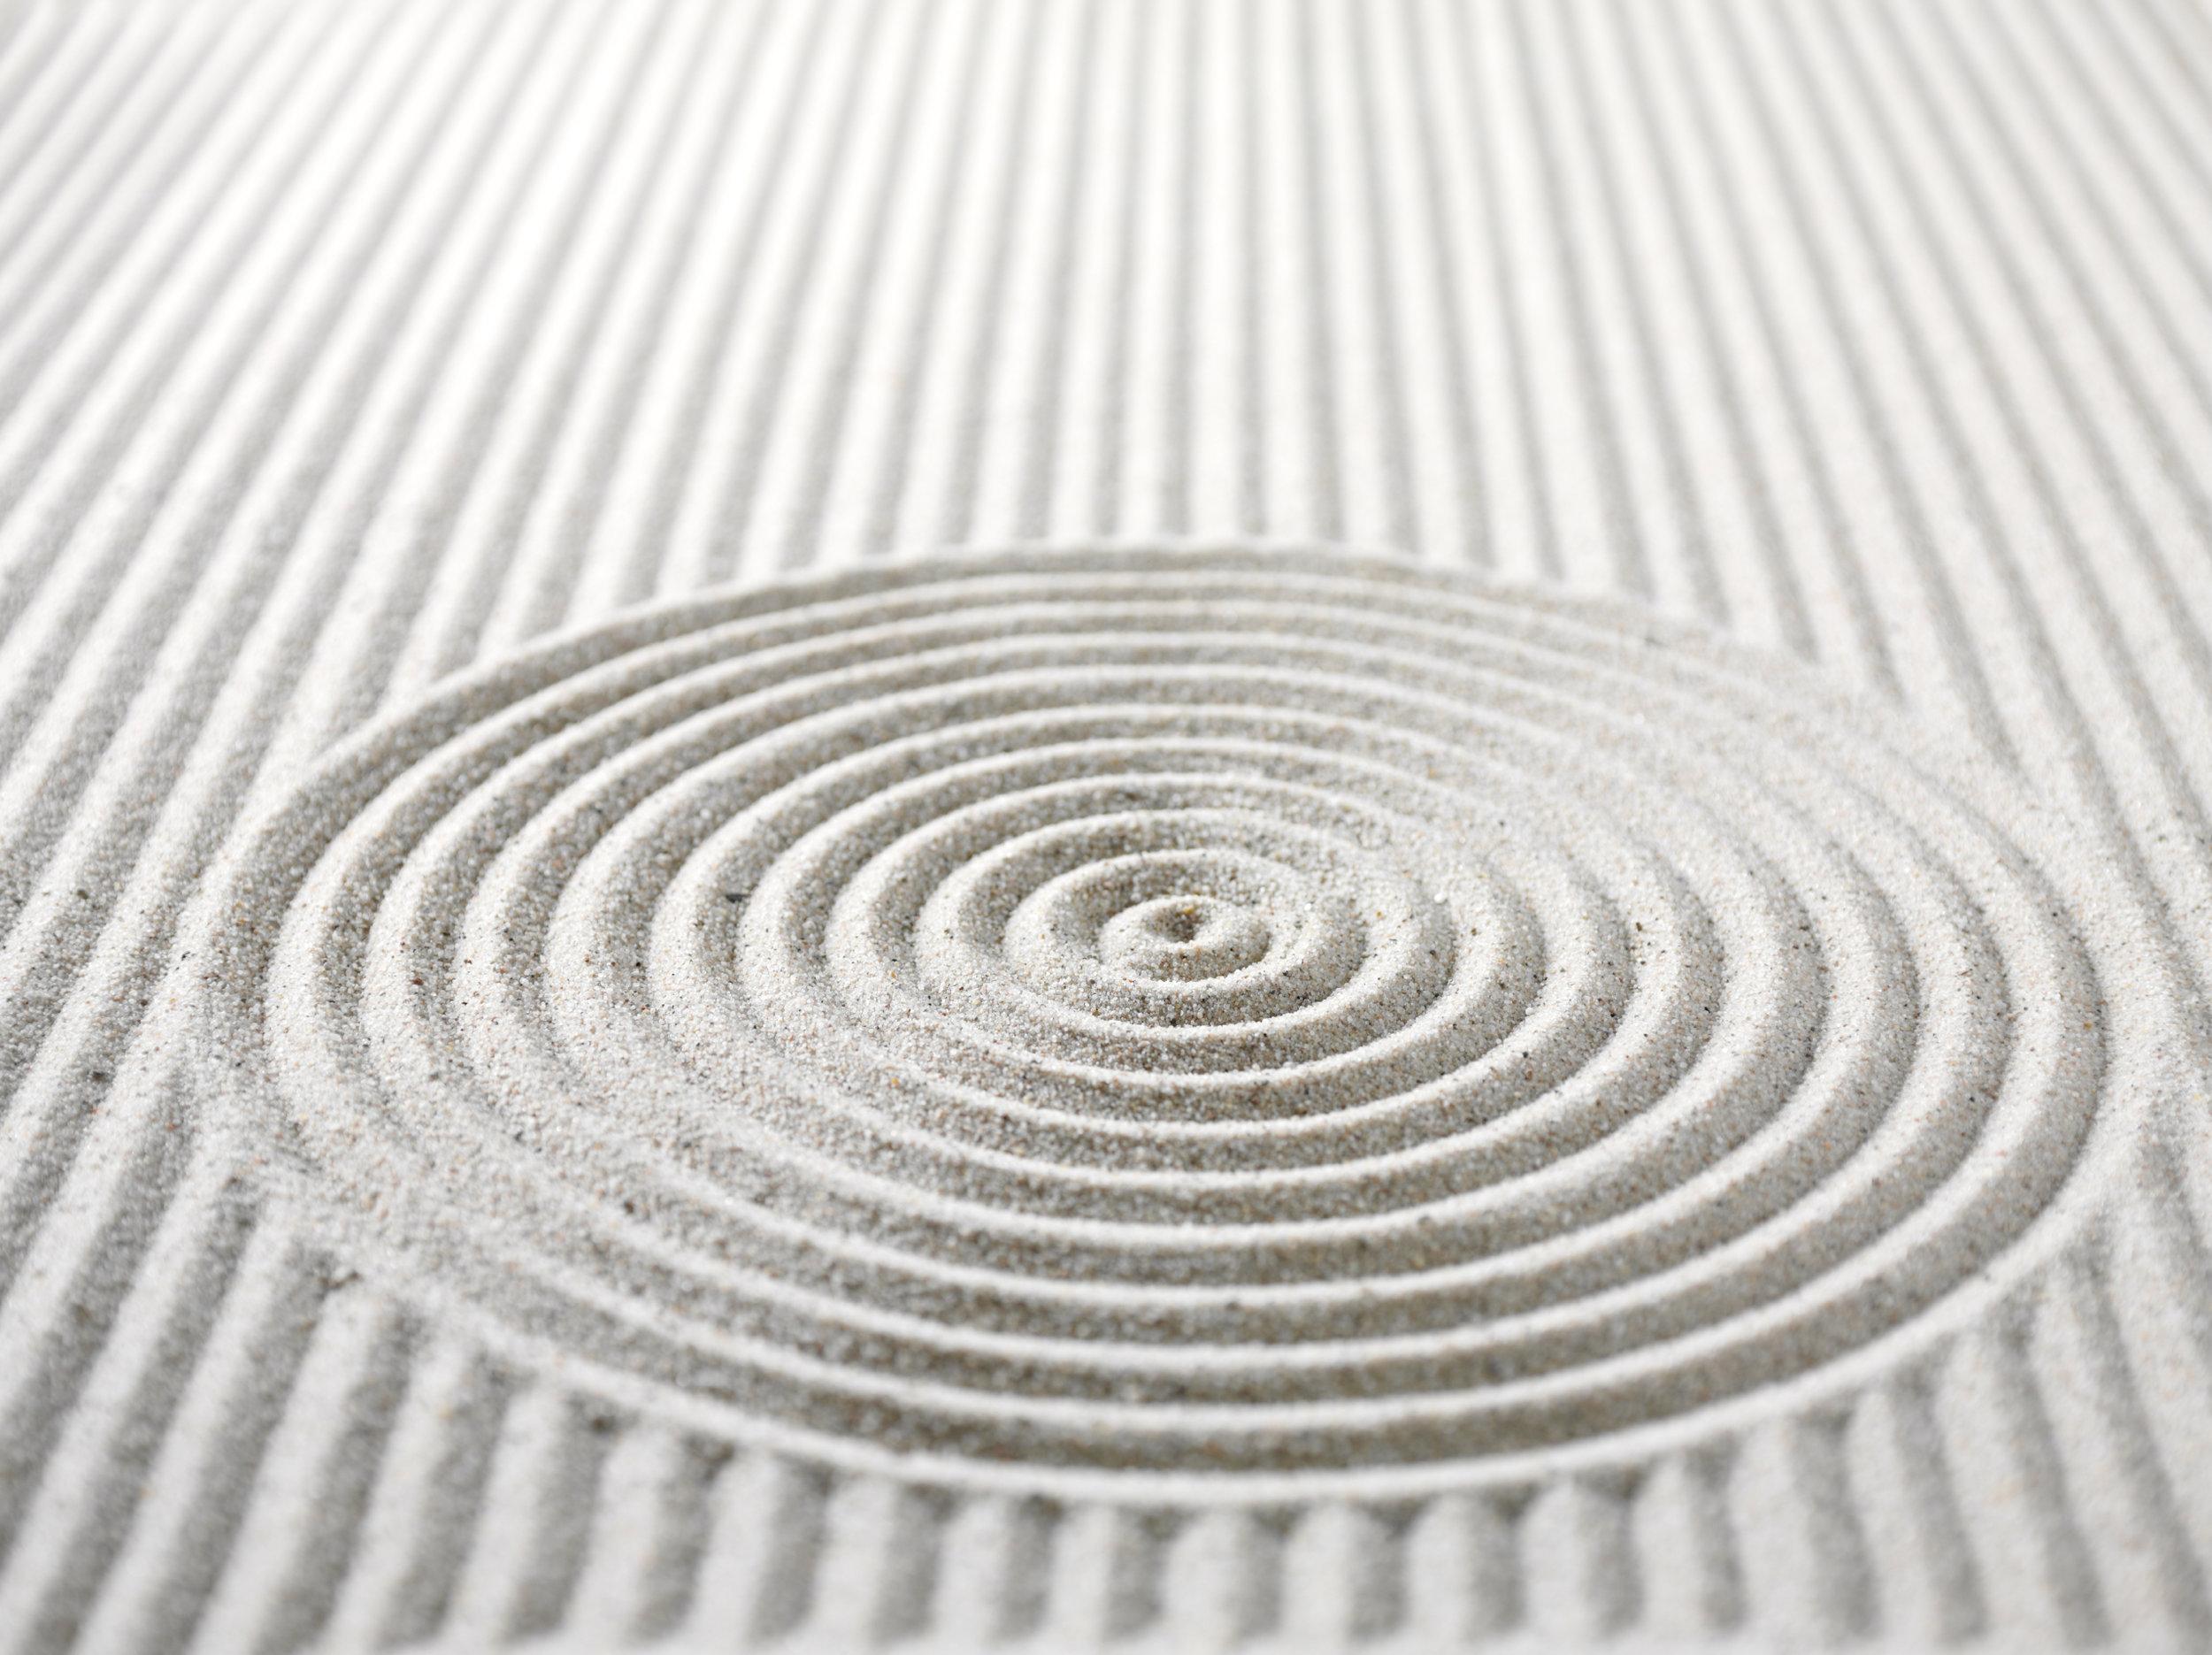 Sand lines iStock_000014350814_Large.jpg